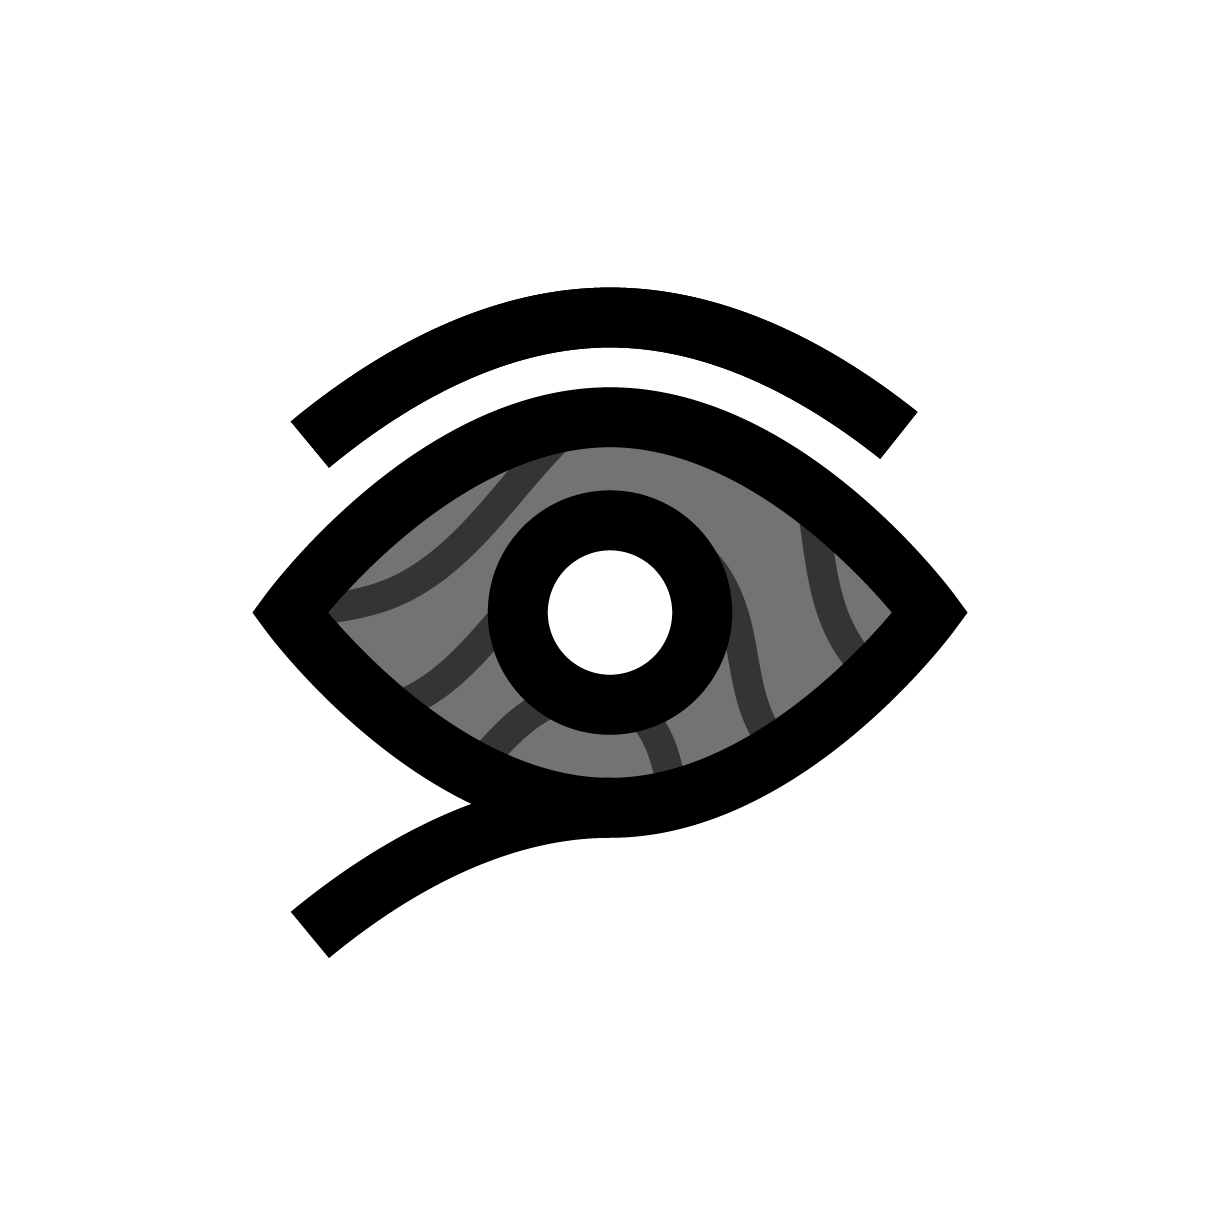 atlas_icon_crdroid-01